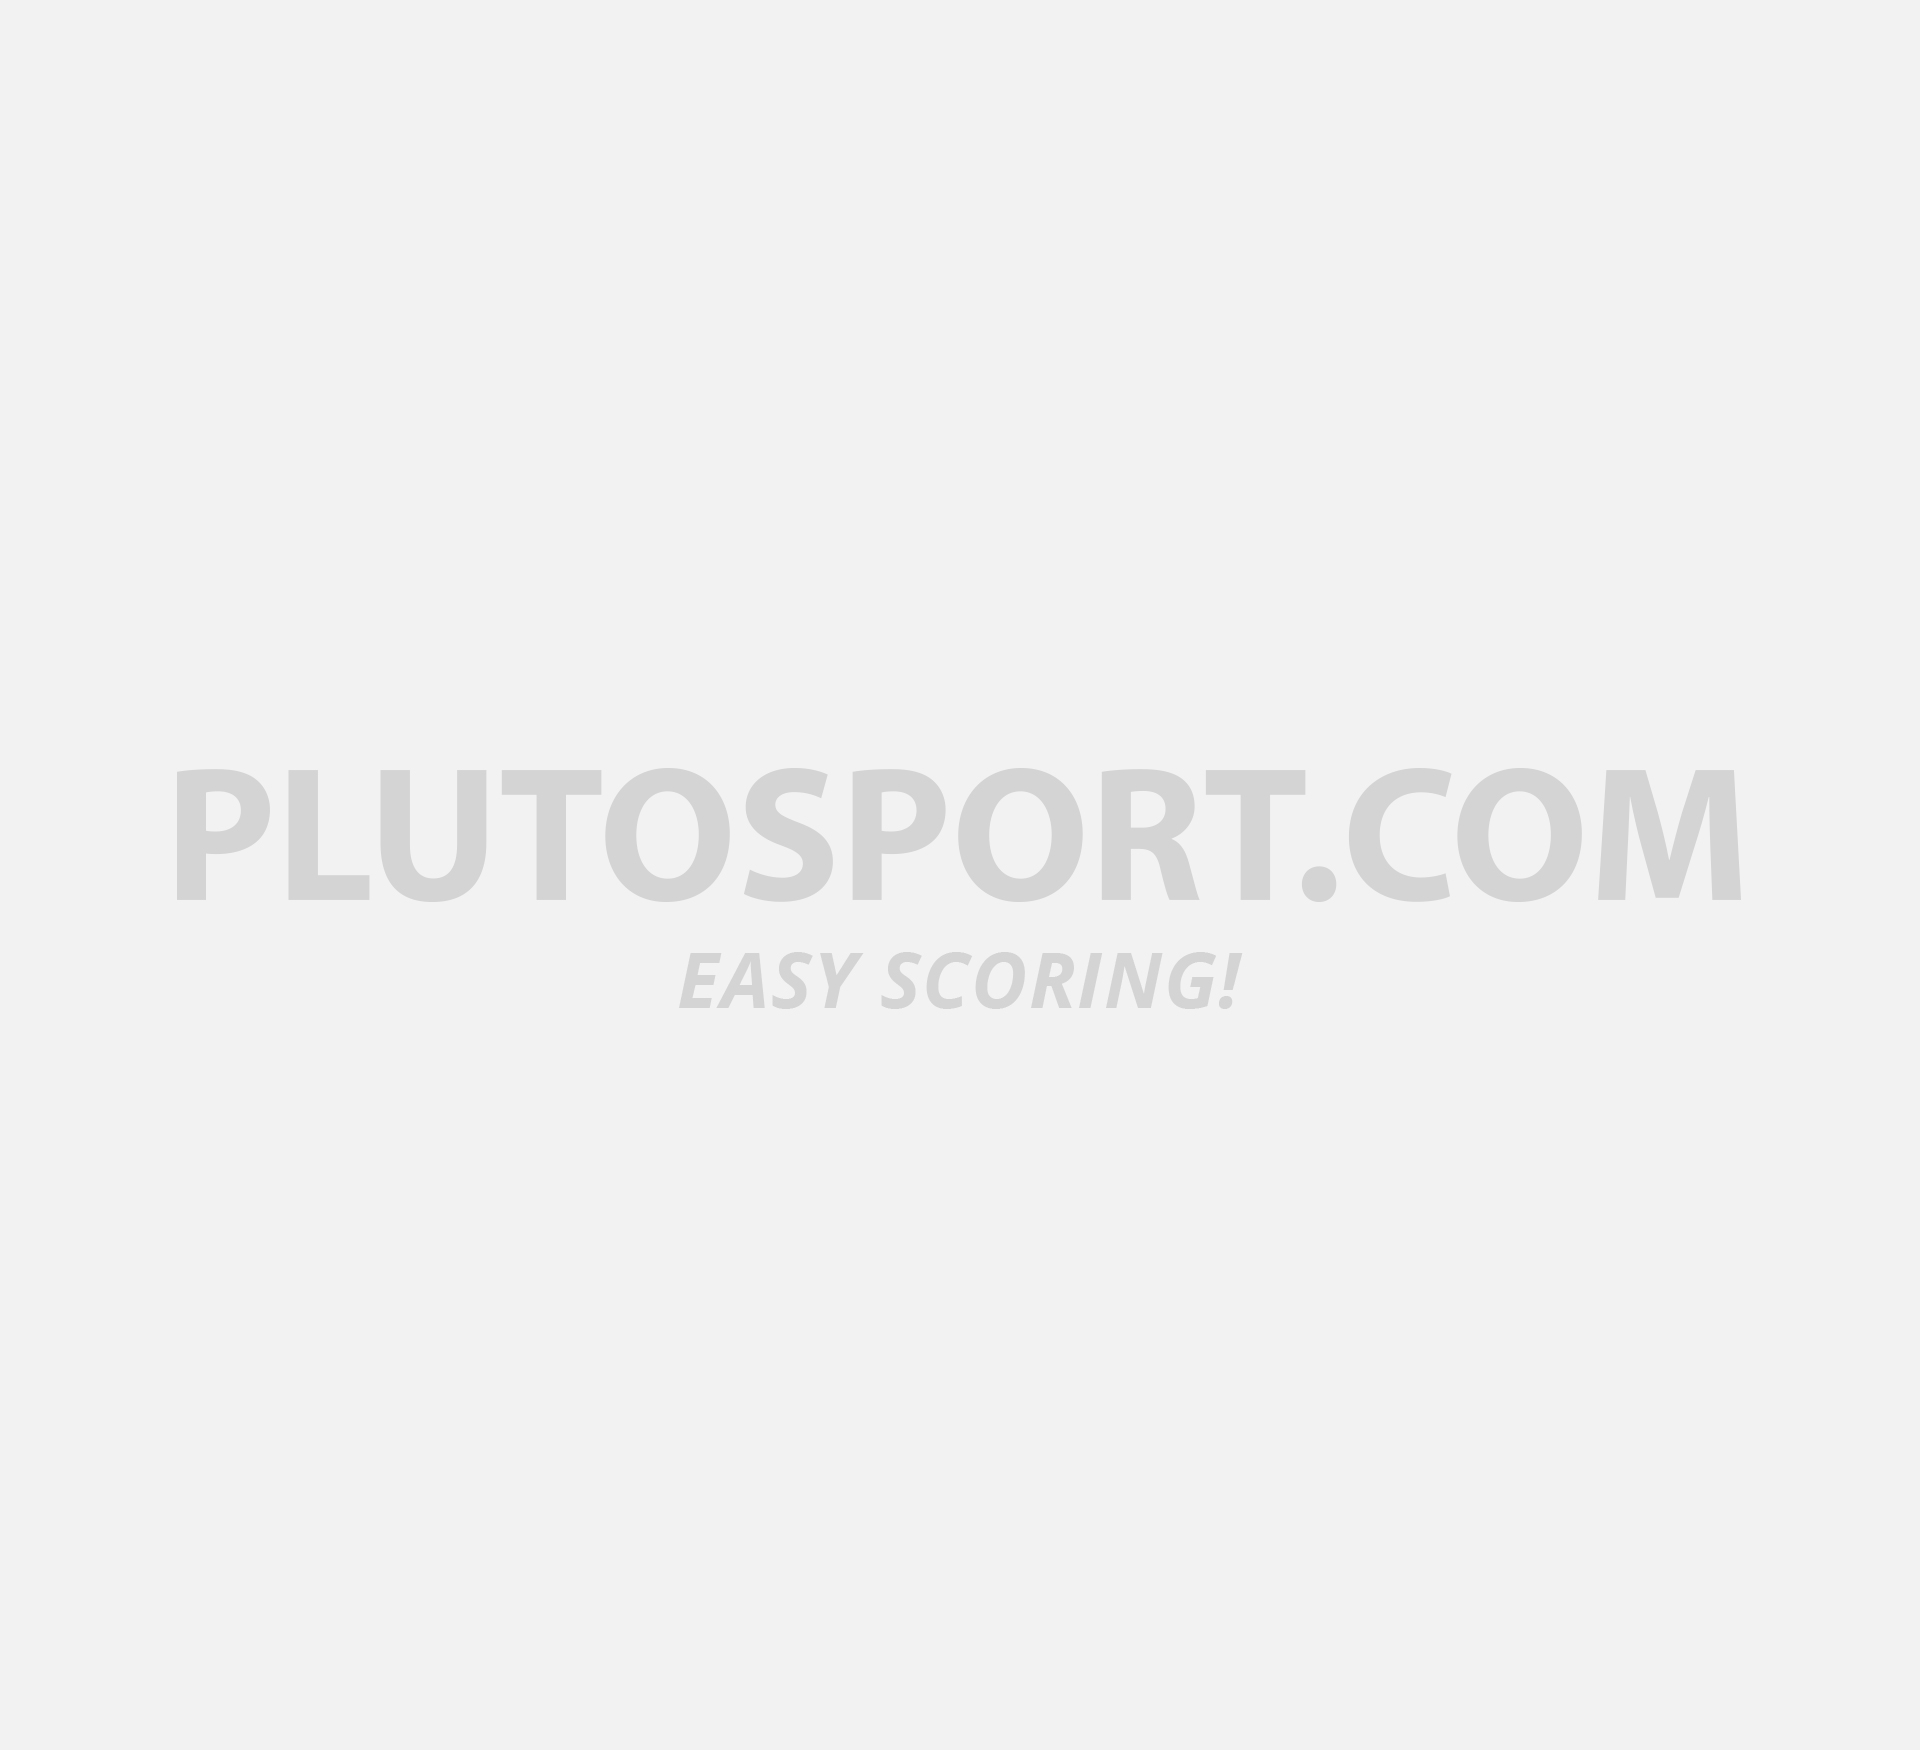 b0988ba8b Nike Lightweight Quarter Socks (3-pack) - Half high - Socks - Clothing -  Lifestyle - Sports | Plutosport